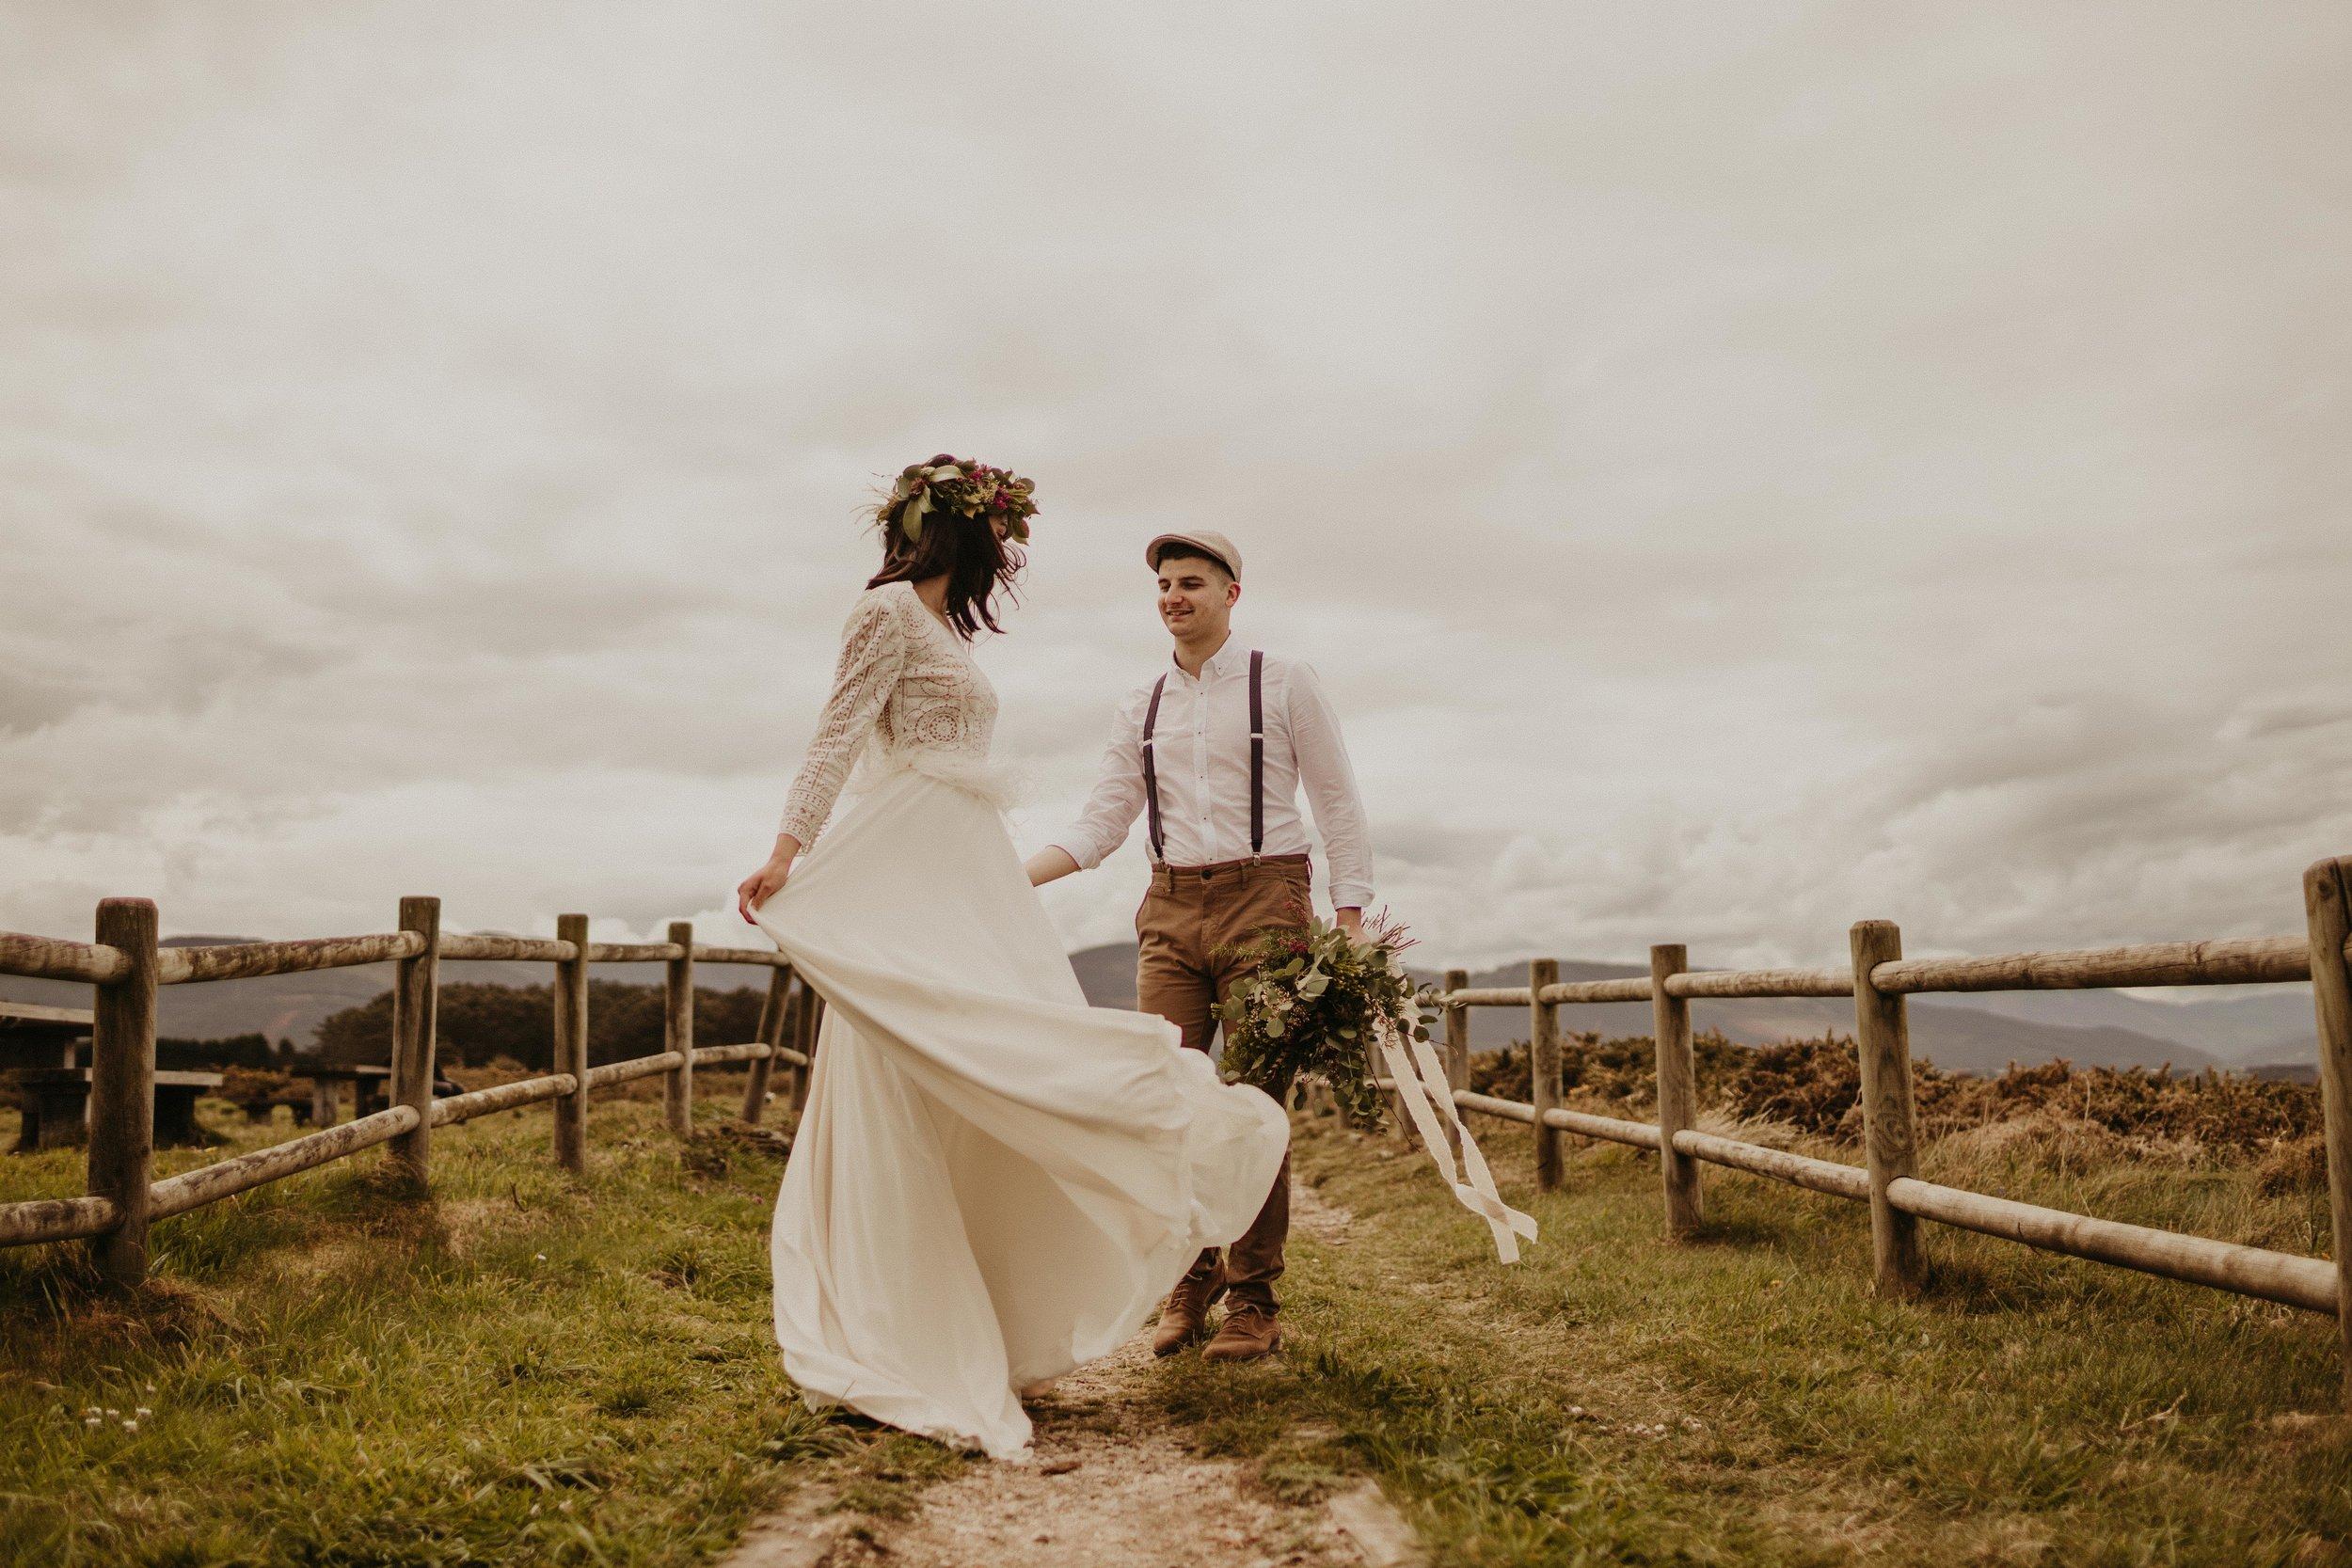 SARA & CRIS -RURAL WEDDING INSPIRATION -